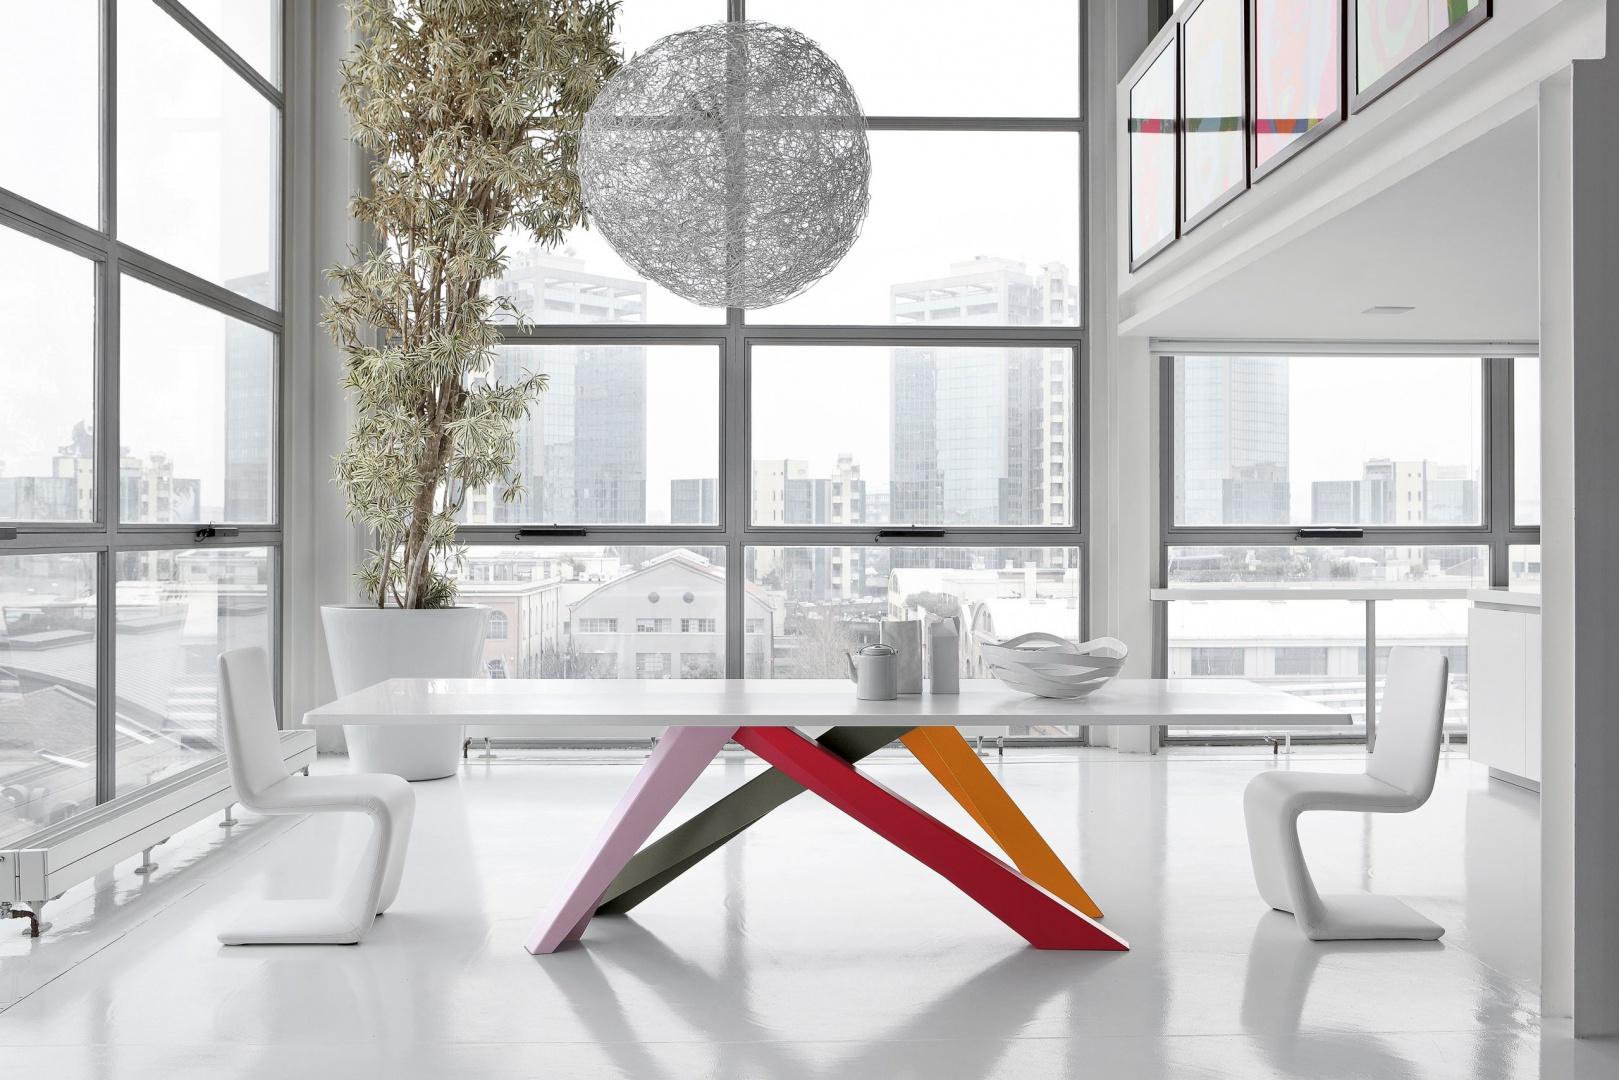 Stół Big Table, krzesła Venere. Fot. Bonaldo